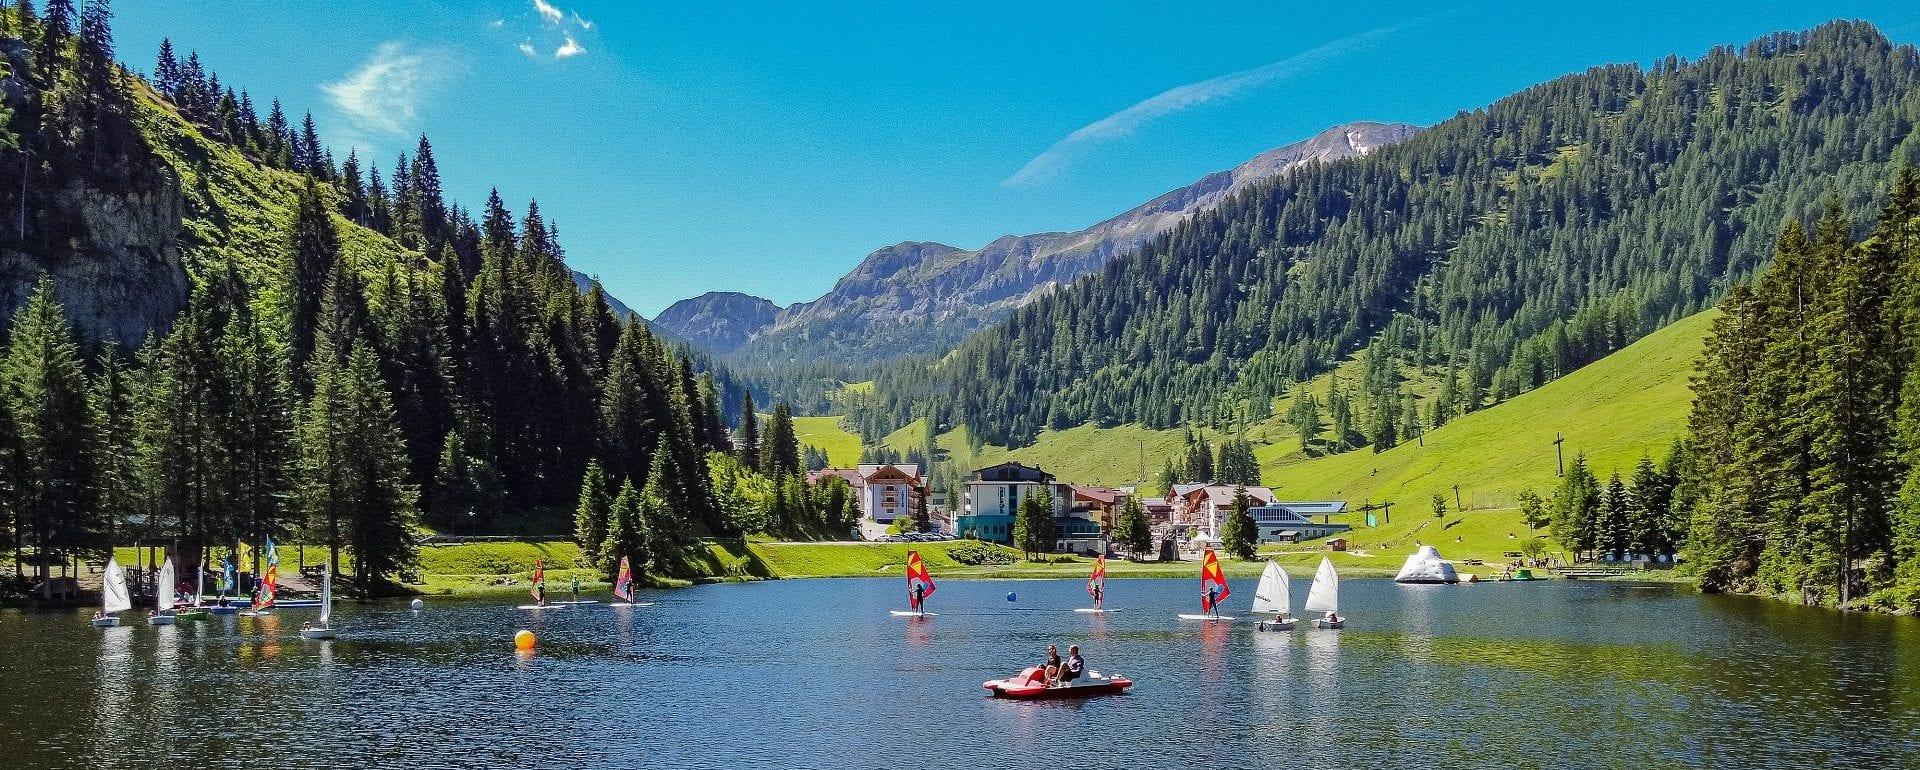 Summer Vacation Lake Hotel Sportwelt